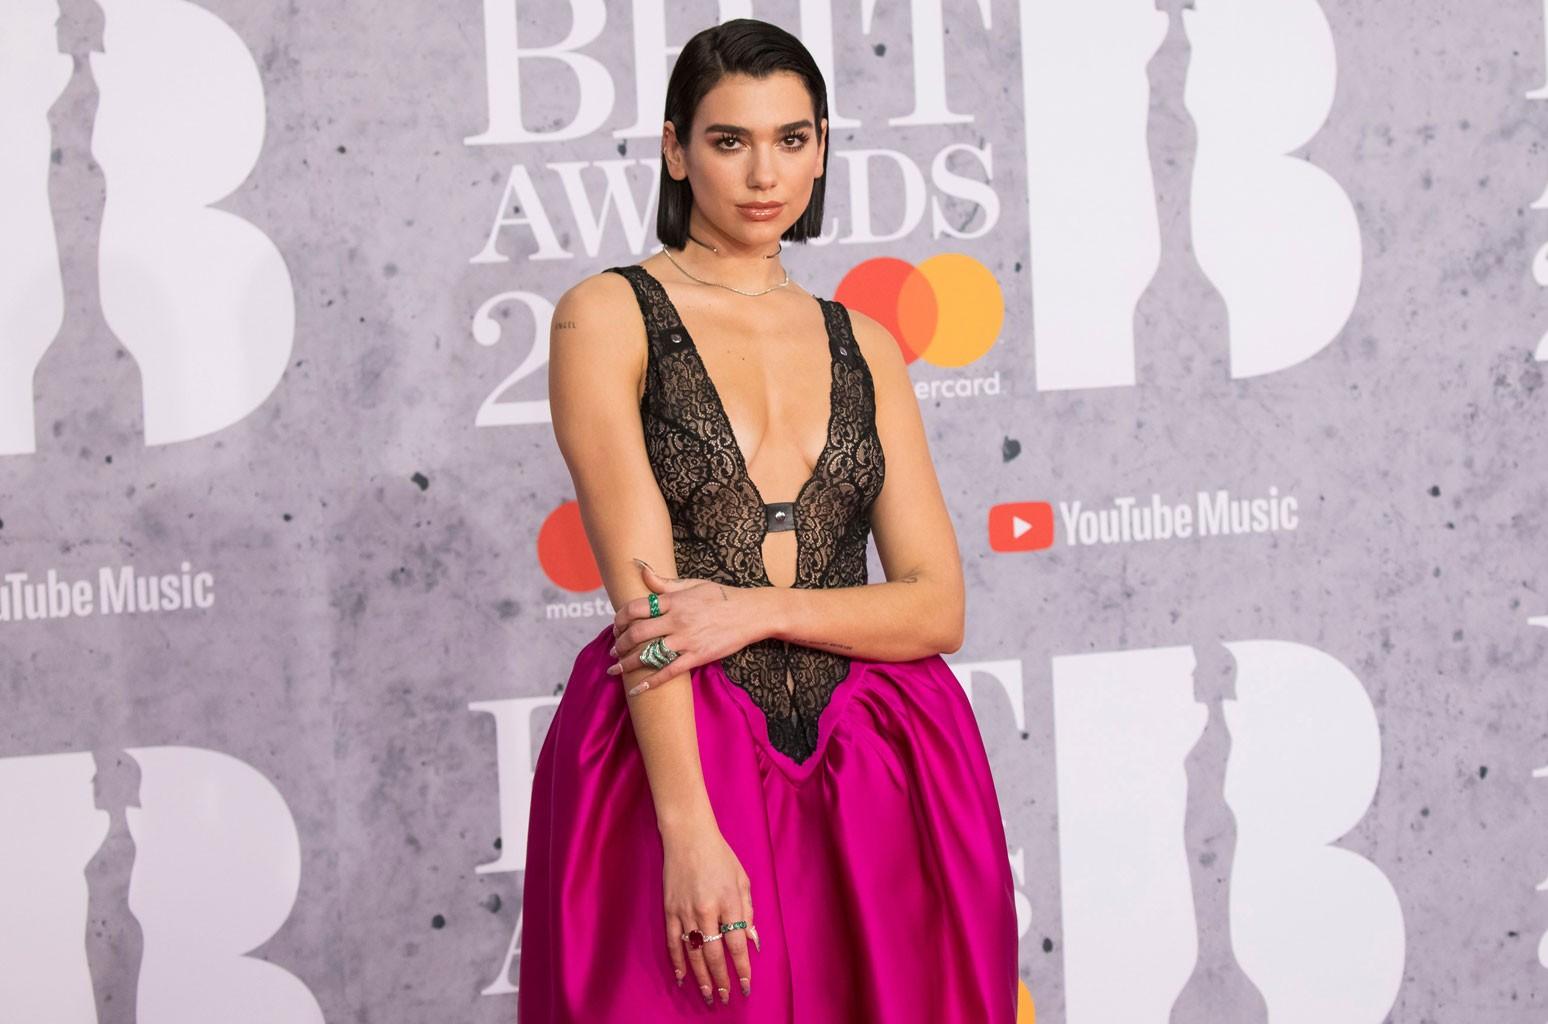 Dua Lipa, Celeste & More Female Artists Land 2021 Brit Award Nominations: Full List